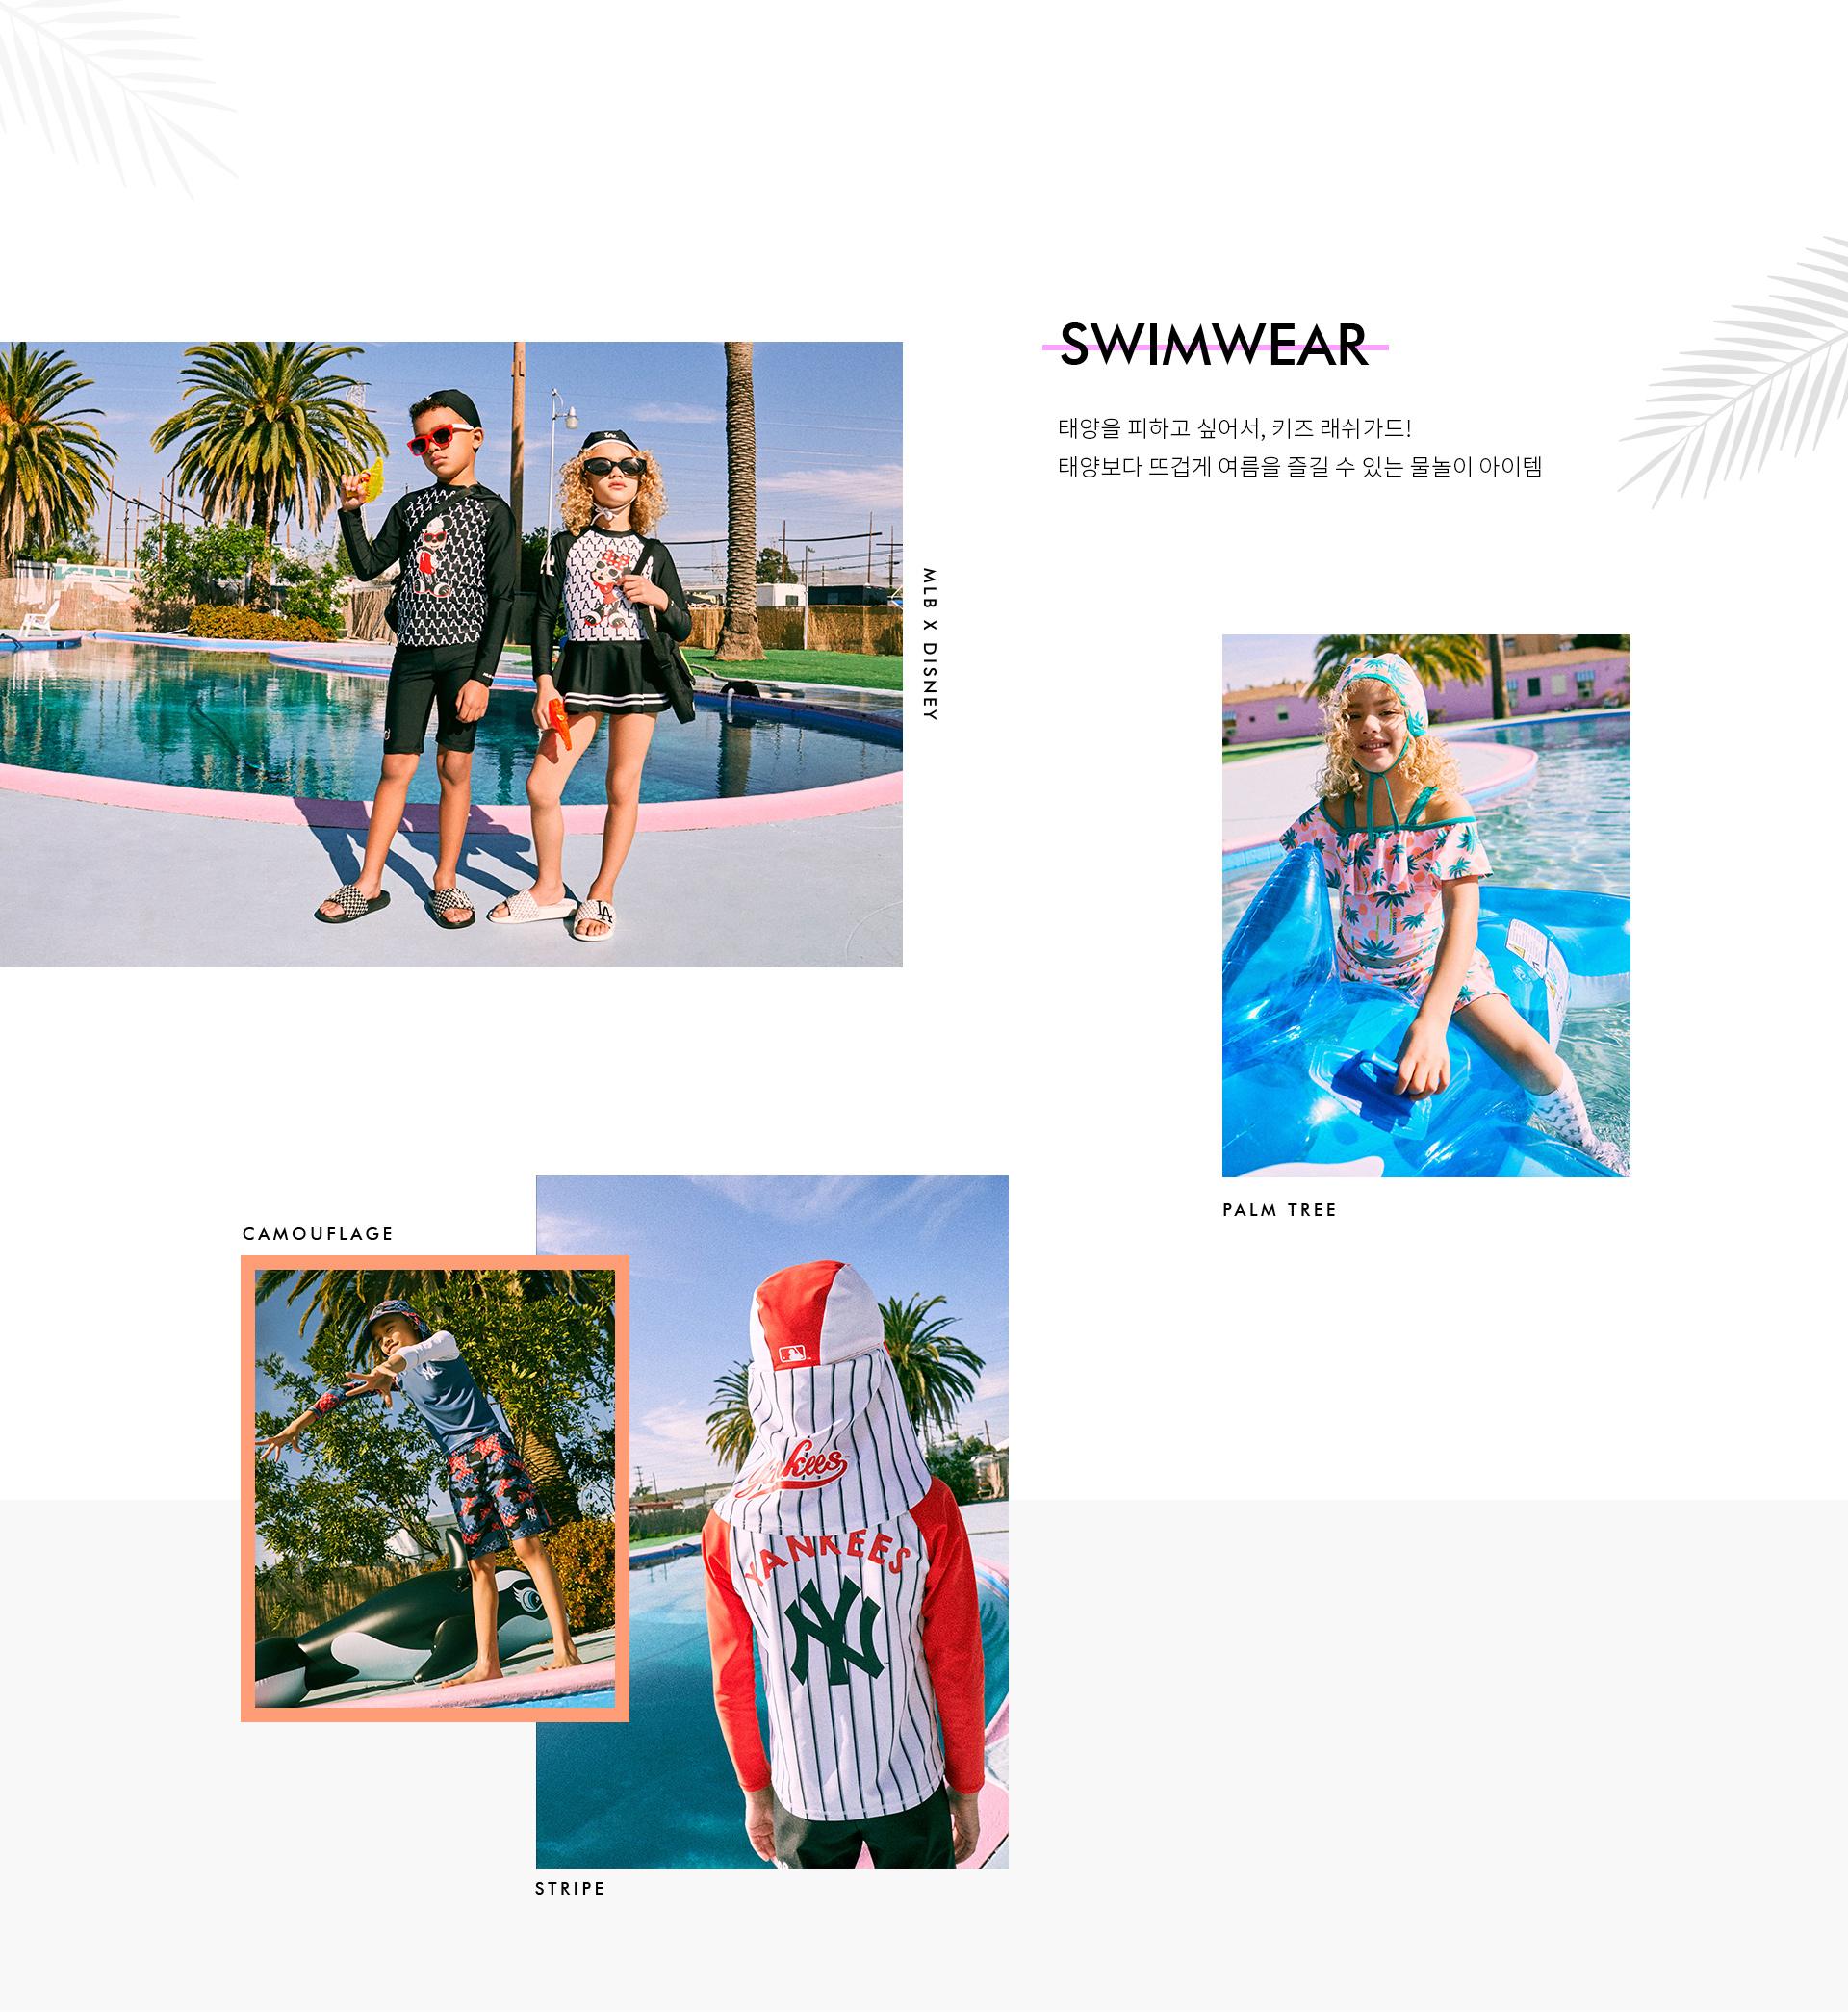 SWIMWEAR 태양을 피하고 싶어서, 키즈 래쉬가드! 태양보다 뜨겁게 여름을 즐길 수 있는 물놀이 아이템 MLB X DISNEY PALM TREE CAMOUFLAGE STRIPE